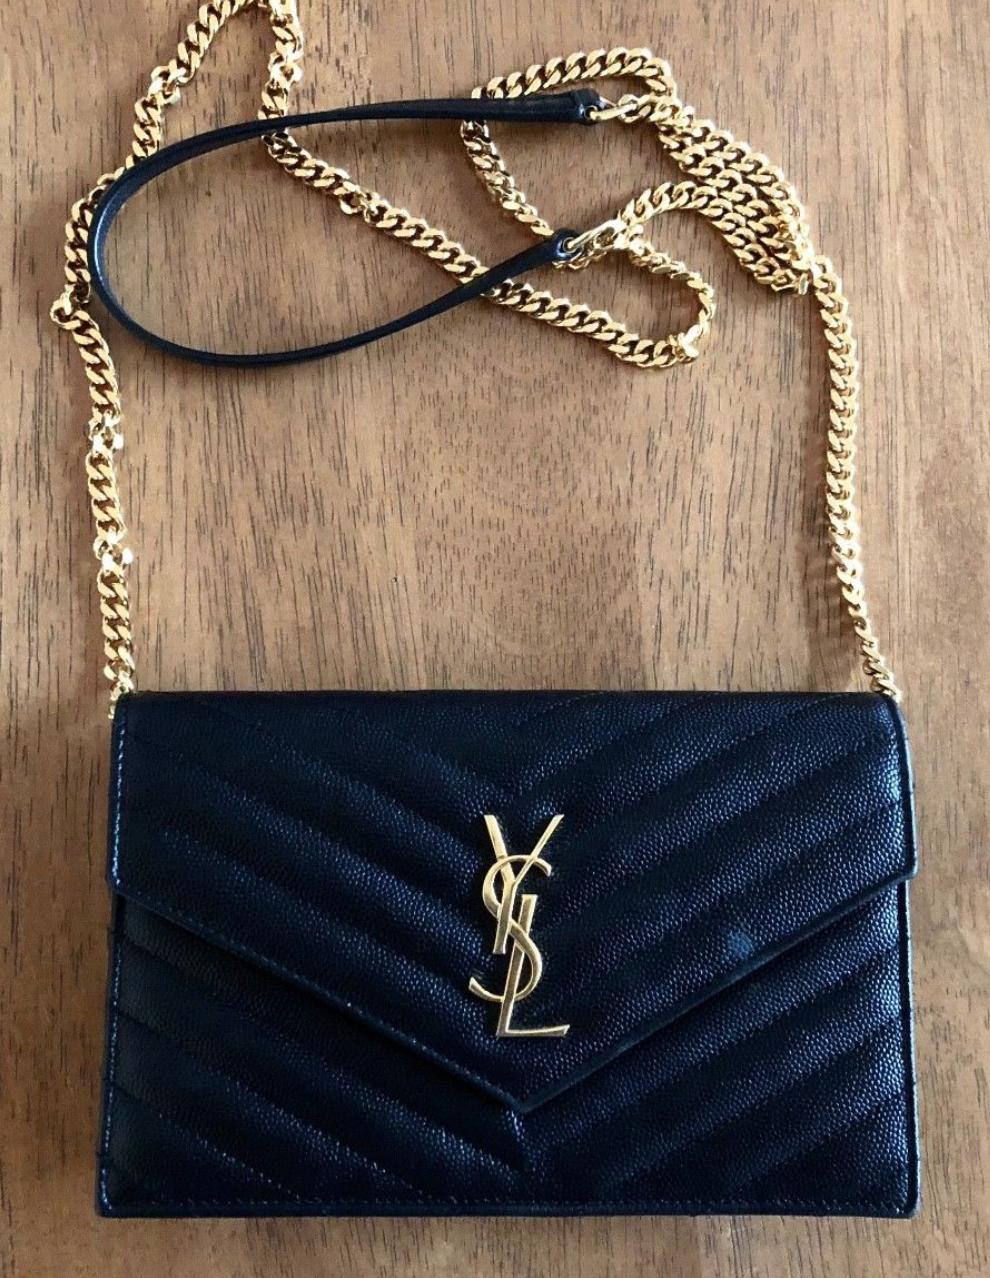 fb8868233076d YSL Envelope Chain Bag in Black Wallet on a chain Yves Saint Laurent Bag  Black bag